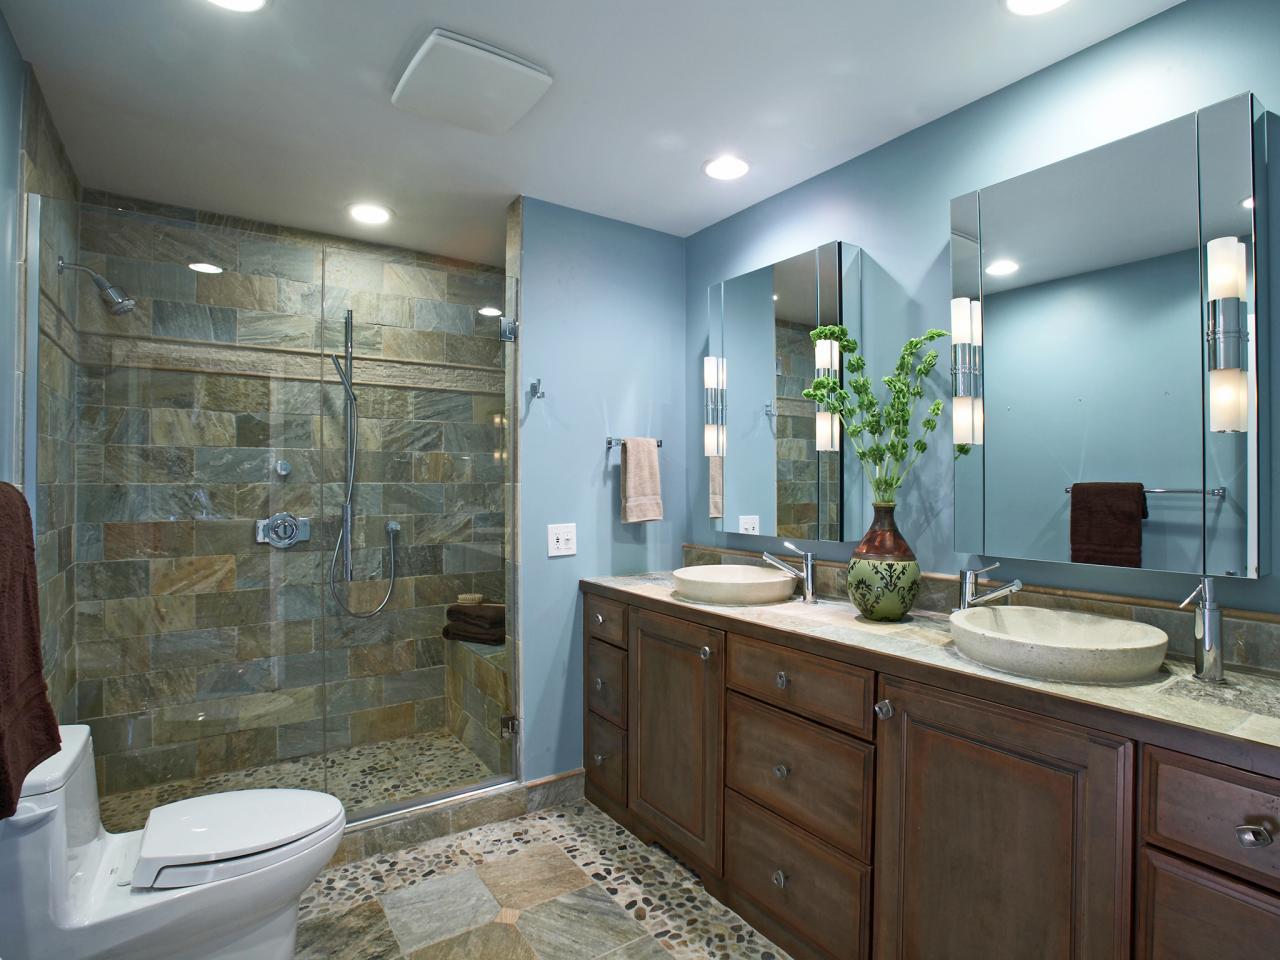 Mesmerizing Smart Bathroom Lighting Ideas The Architecture Designs